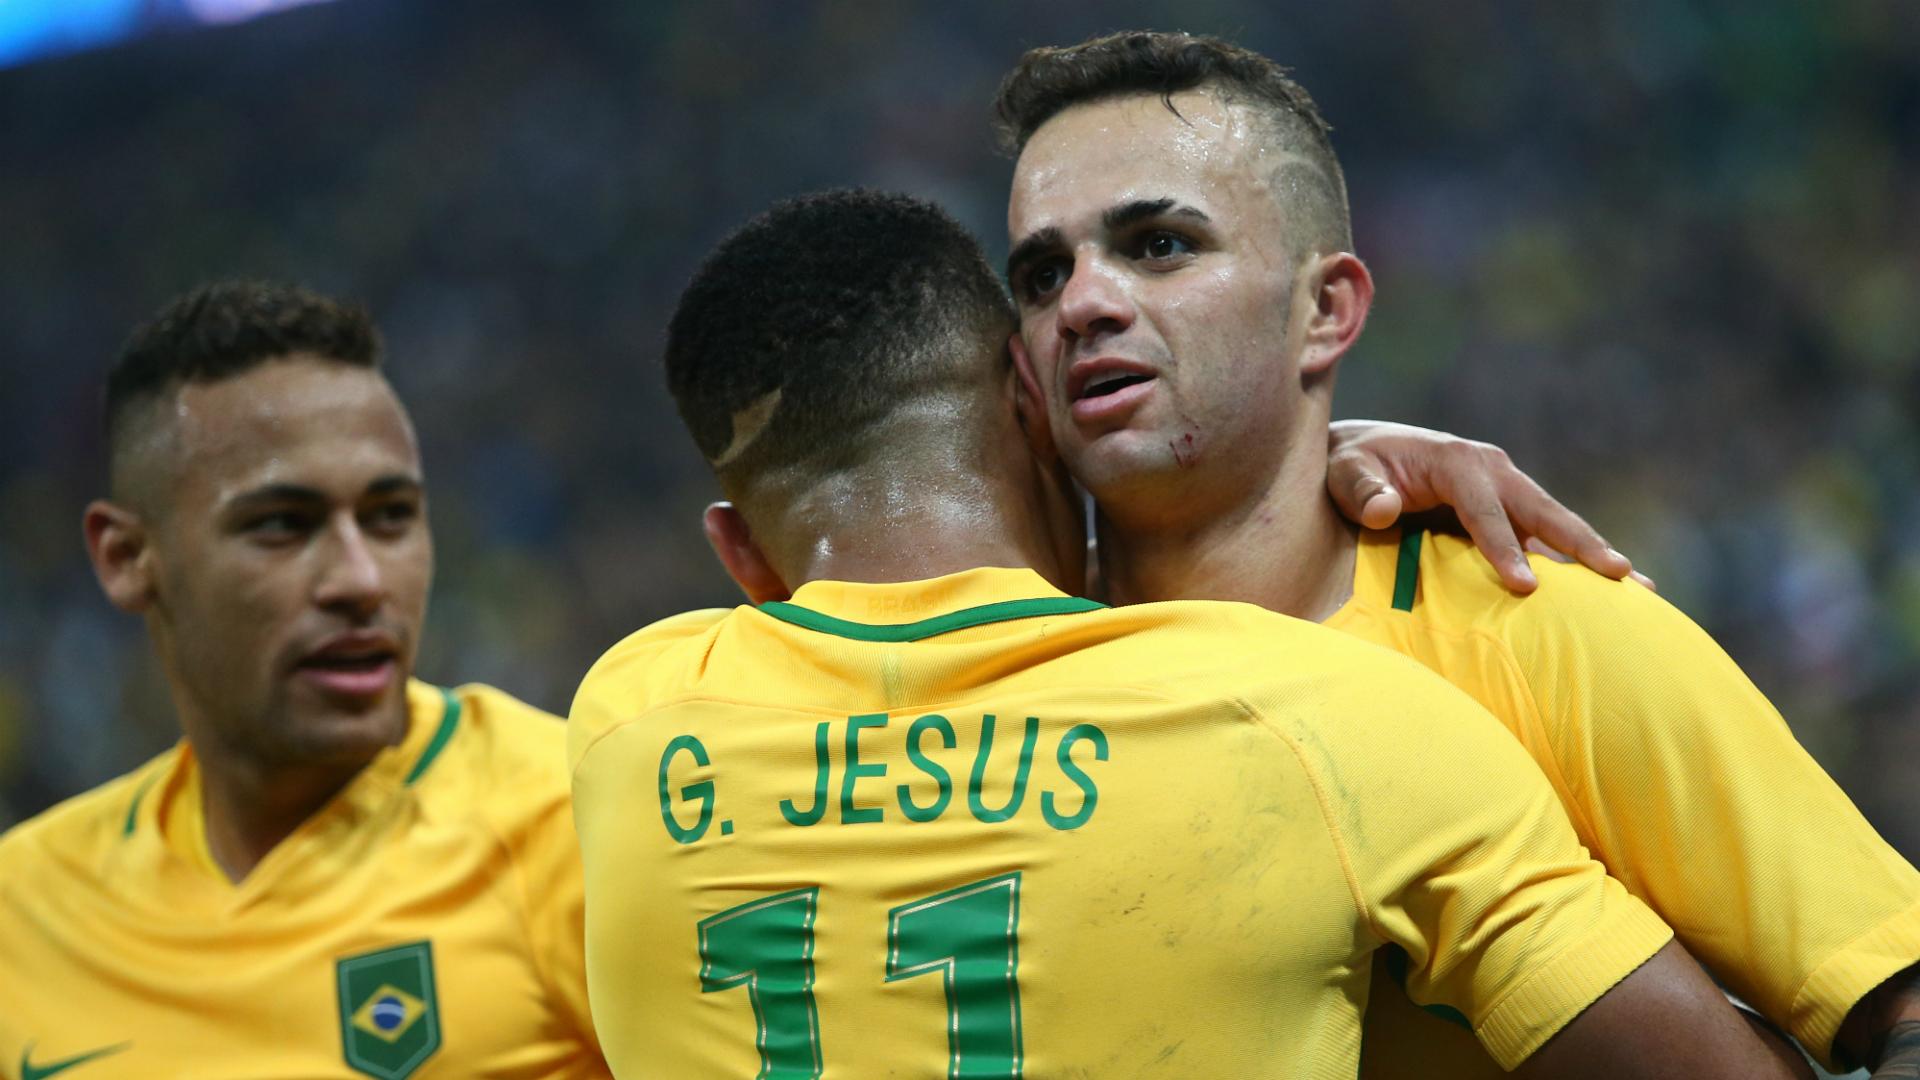 Luan Neymar Gabriel Jesus Brazil Olympics